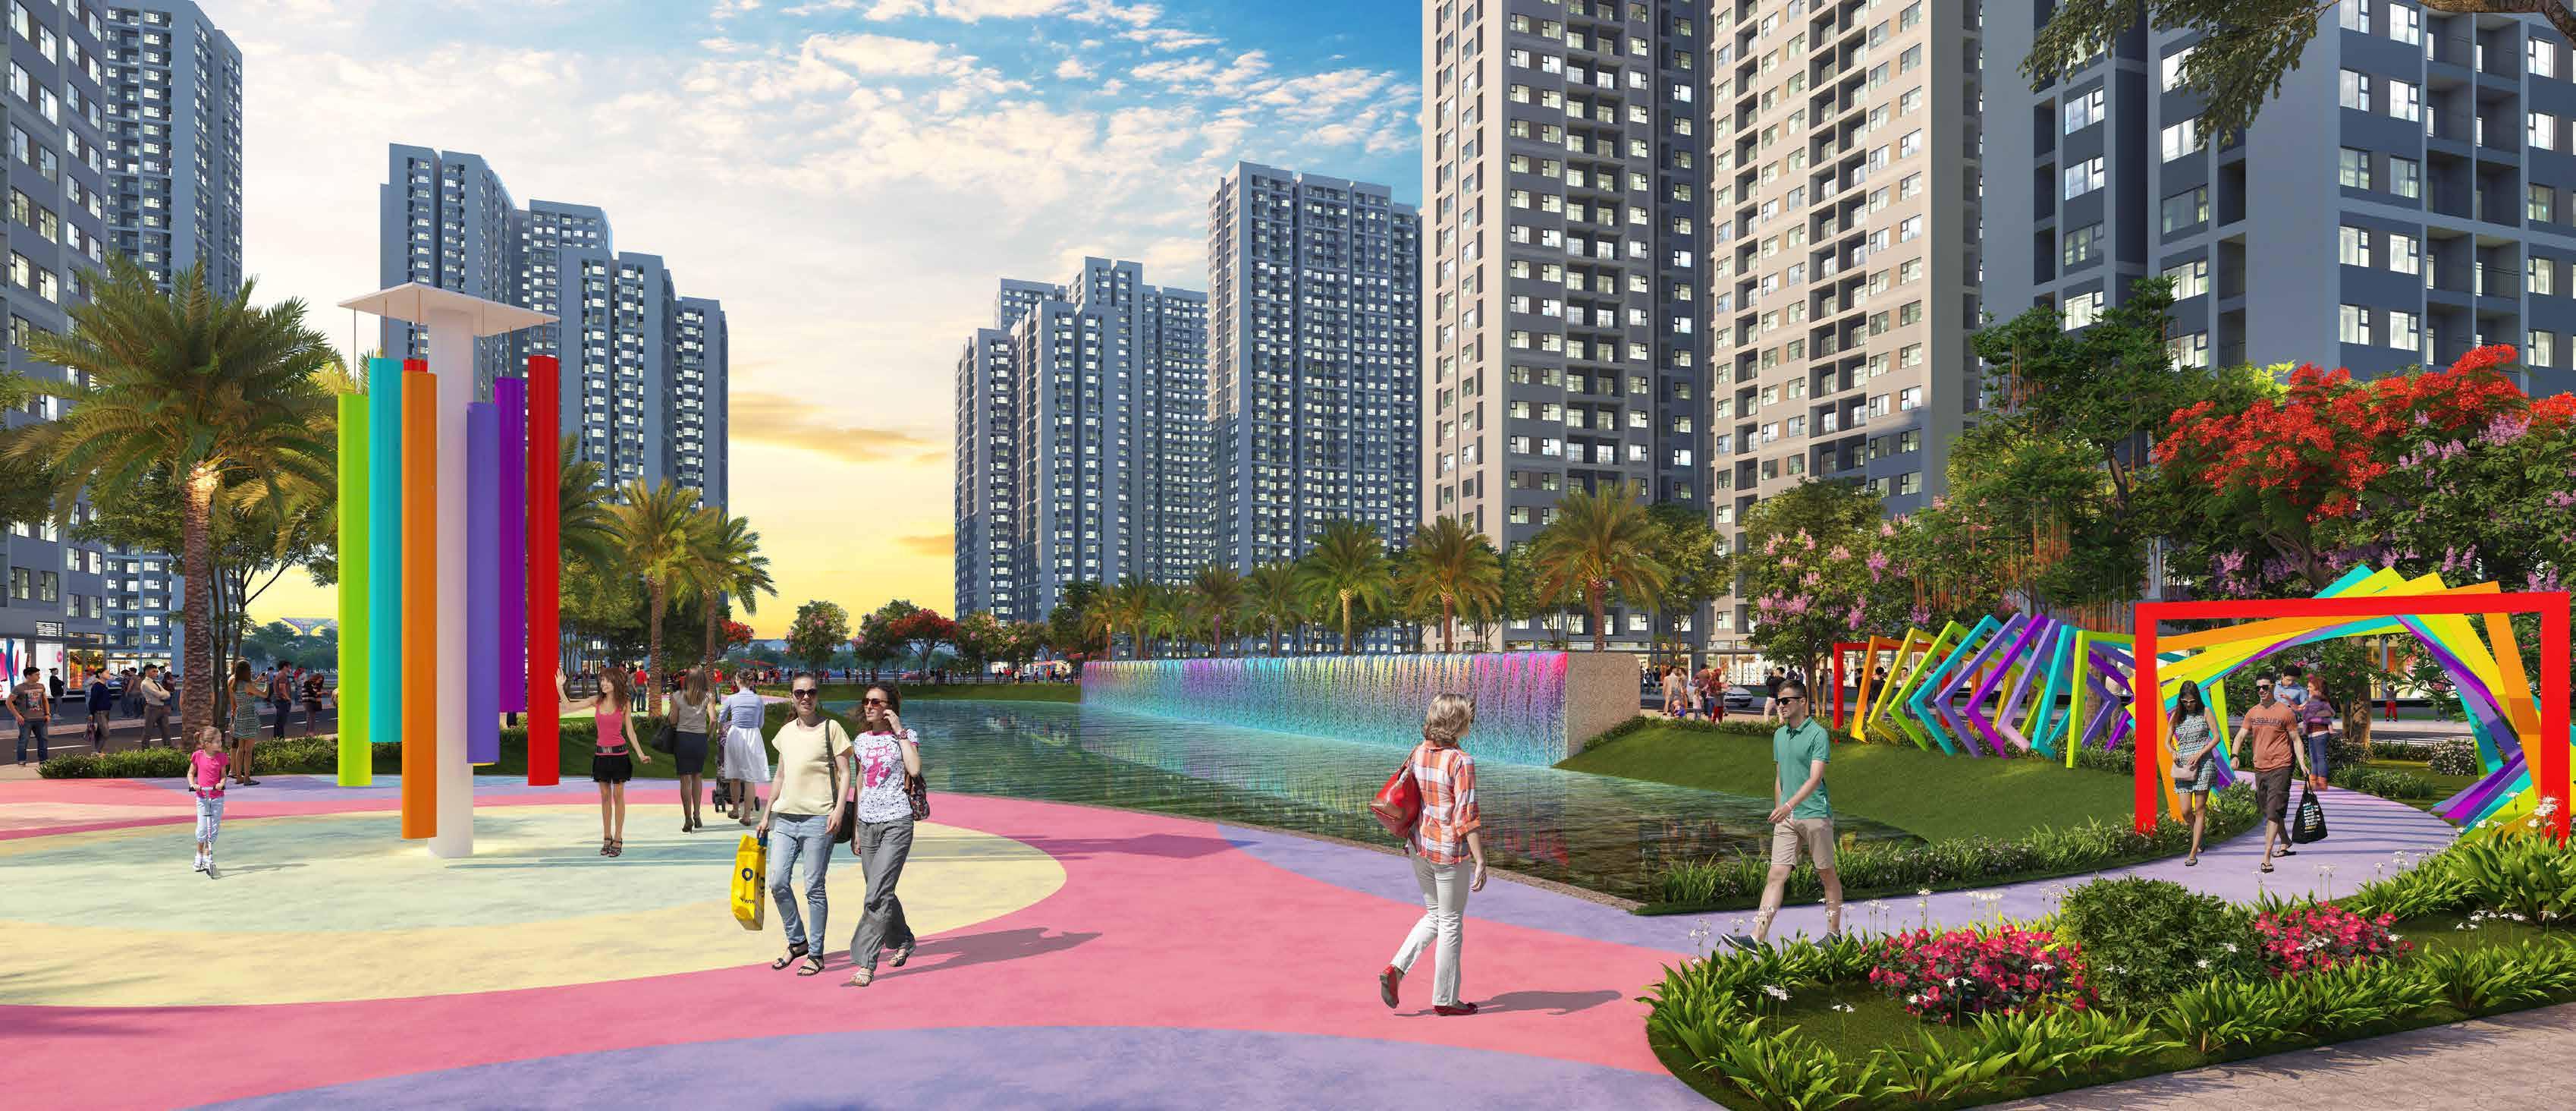 Vinhomes Grand Park Mang Lai Cuoc Song Van Minh Phon Hoa